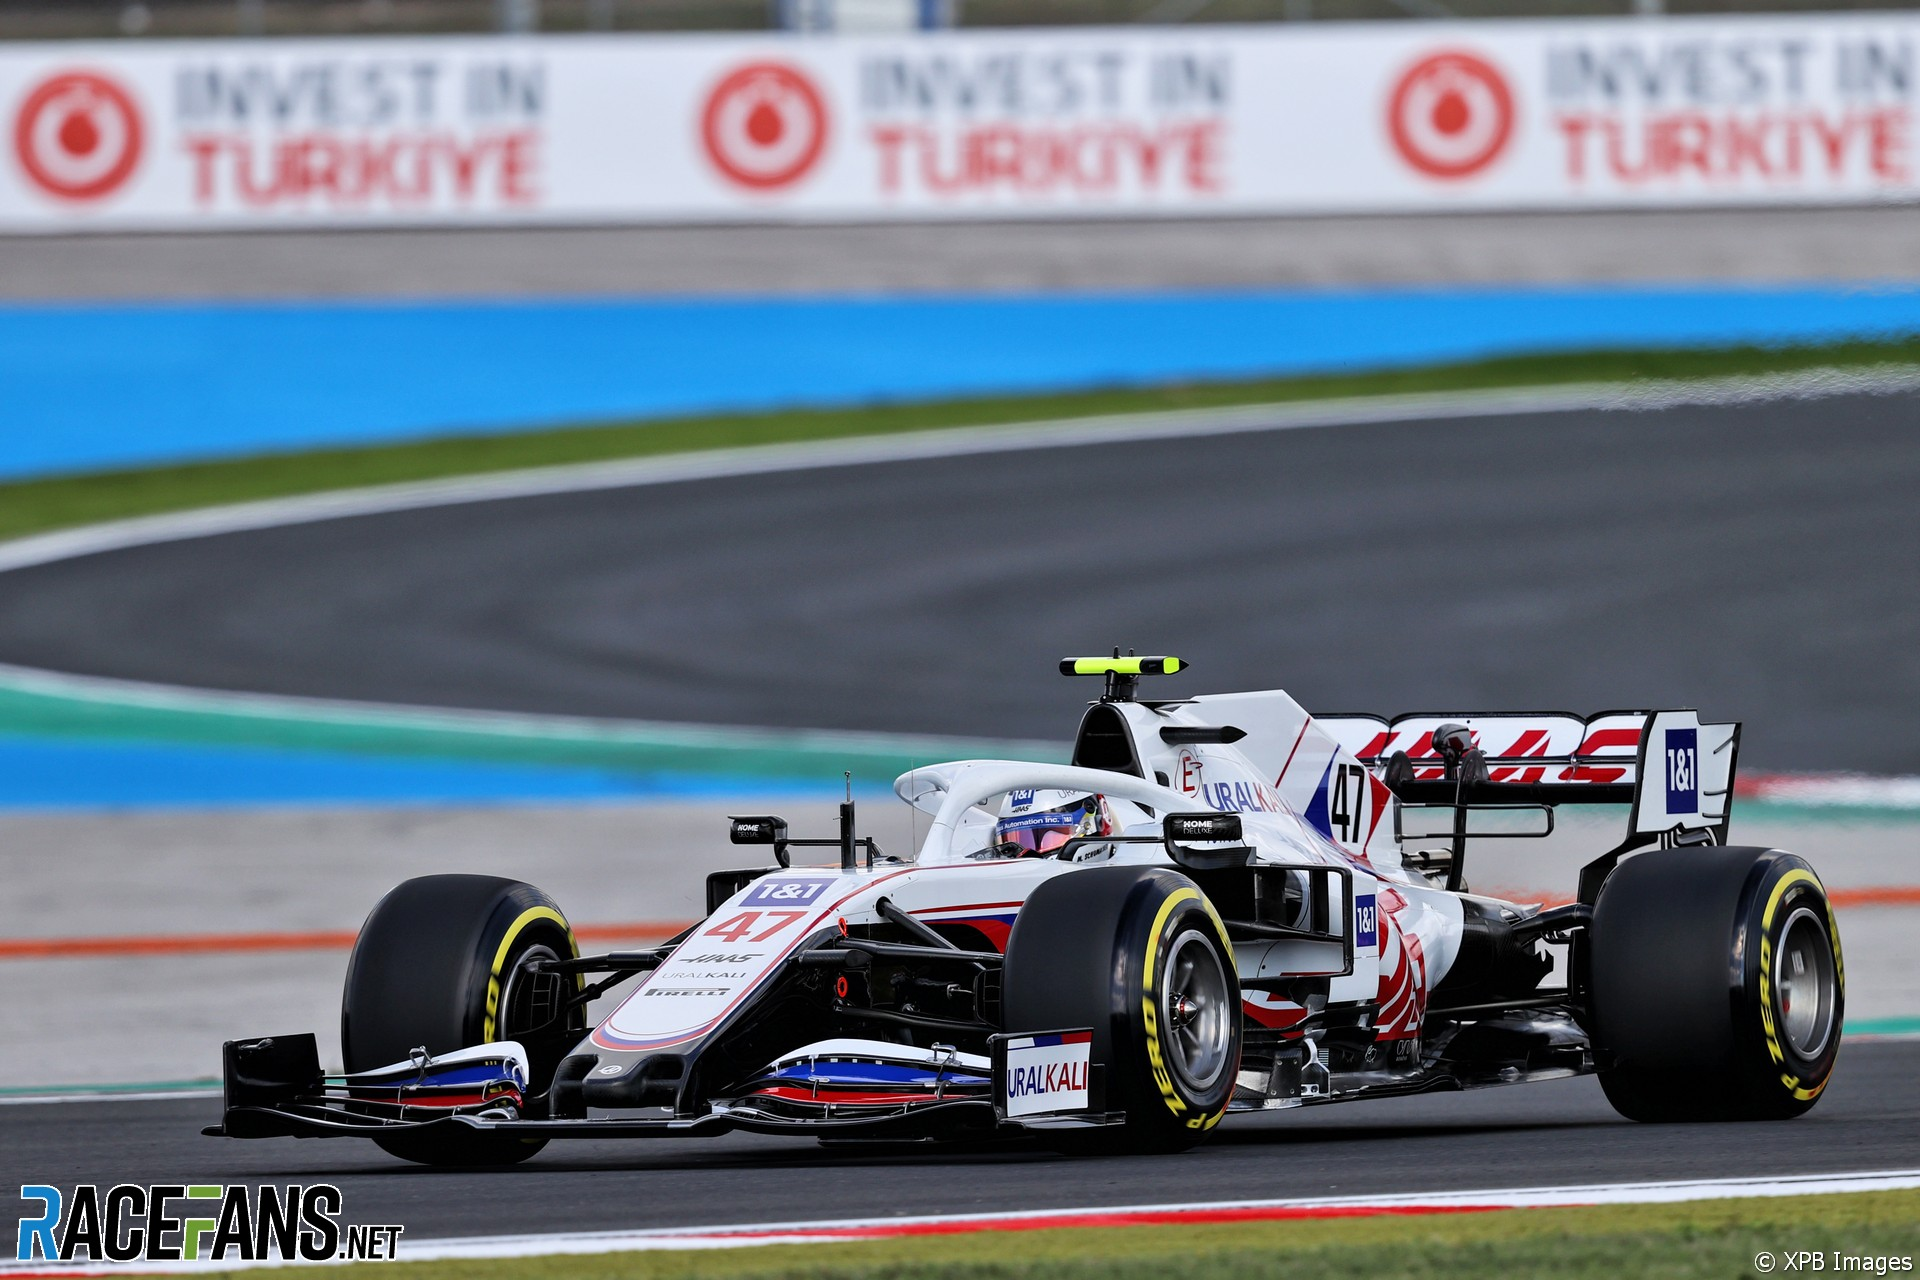 Mick Schumacher, Haas F1 Team, VF21